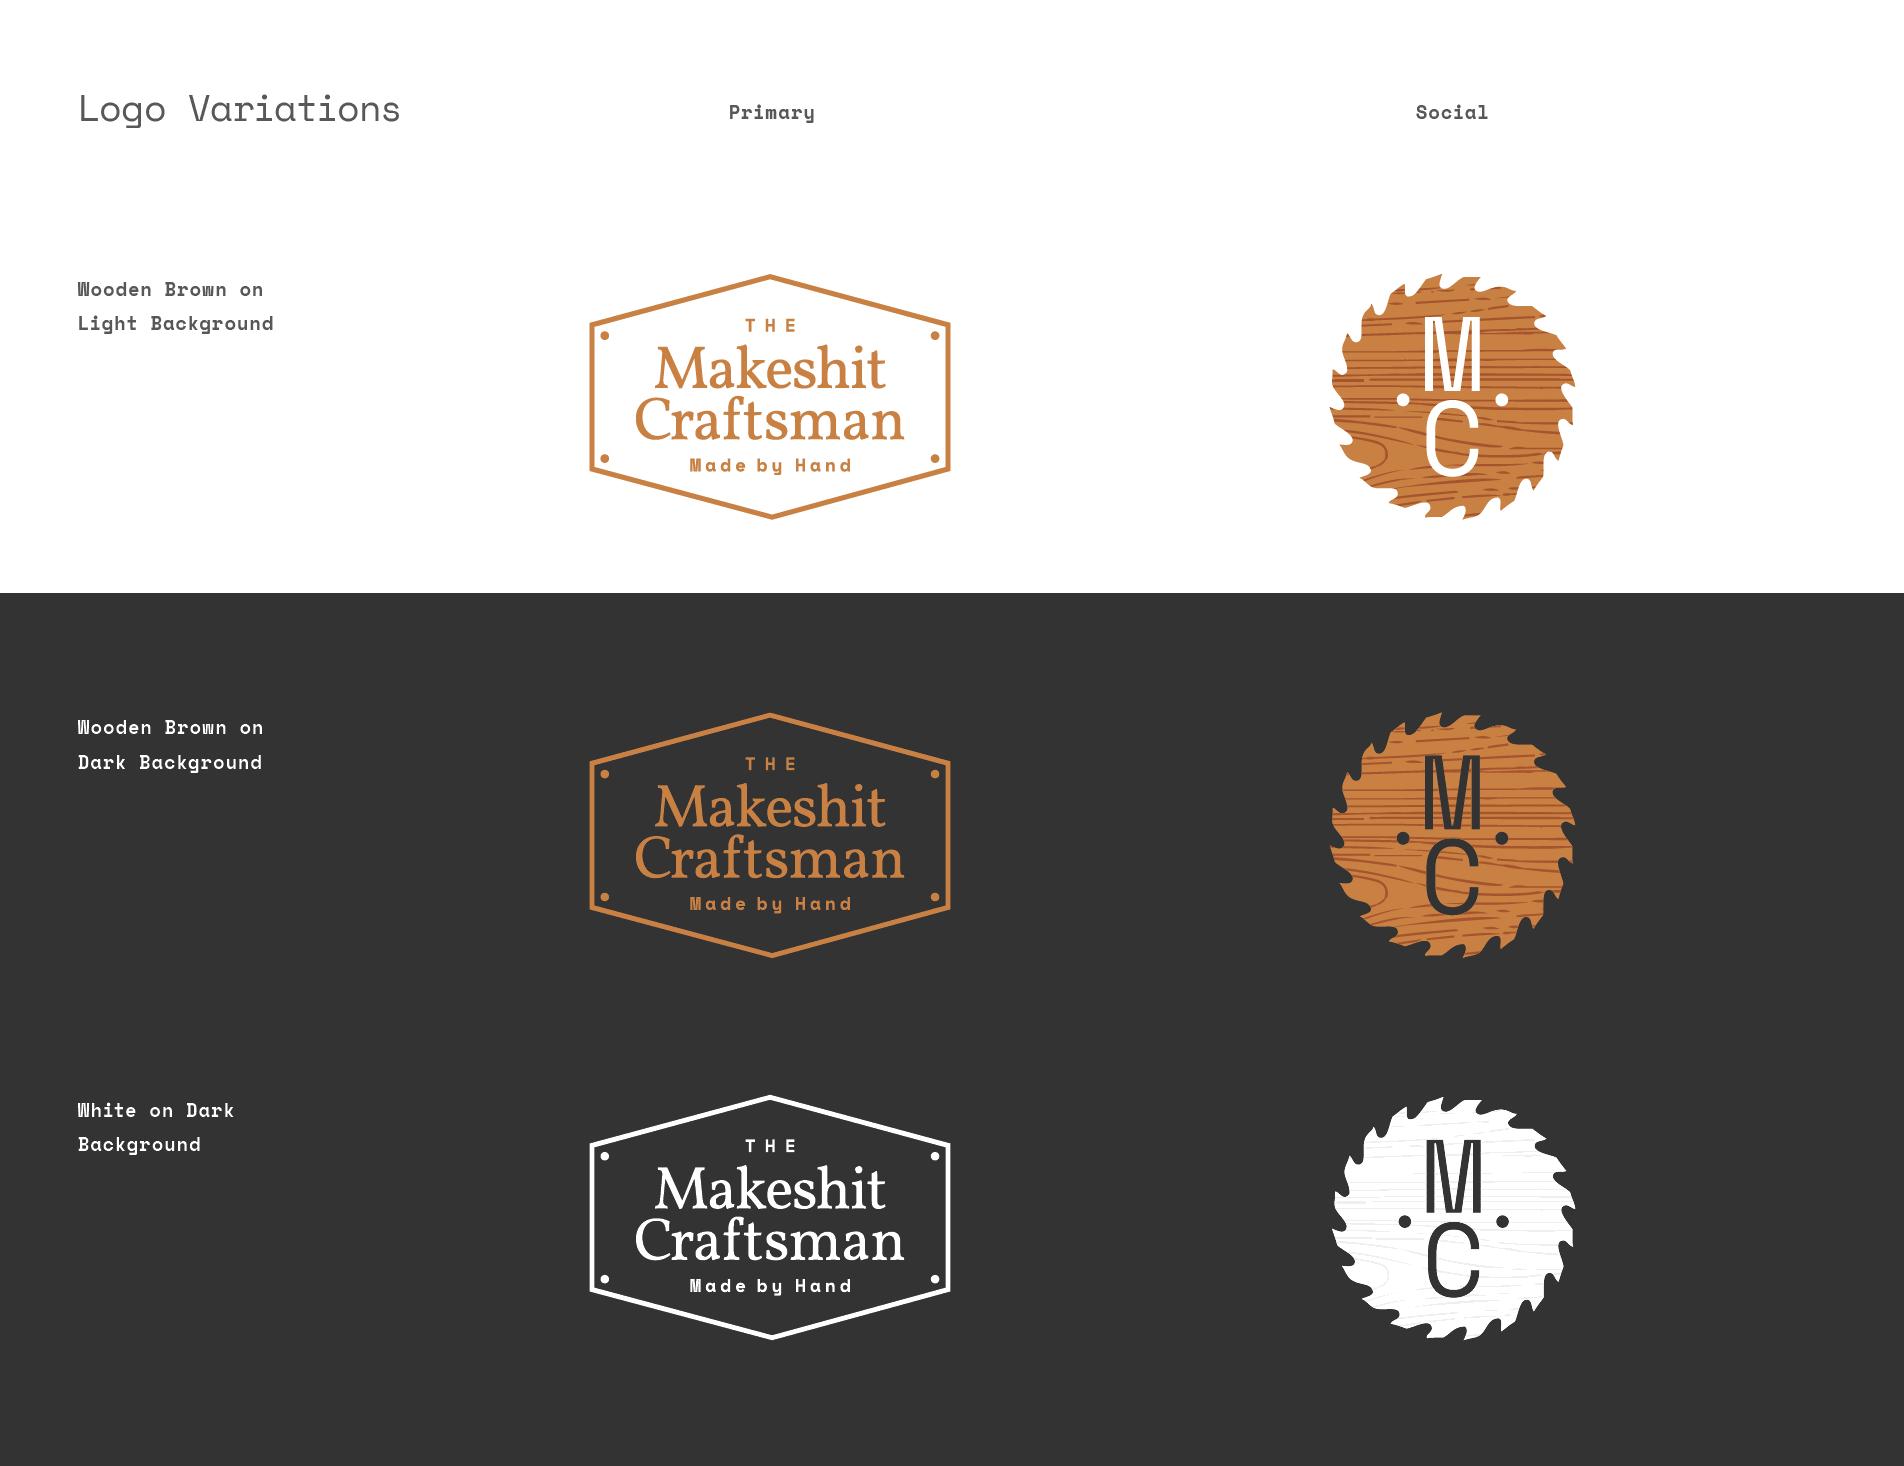 cheers-studios-digital-branding-columbus-ohio-MC-logo-variations.jpg